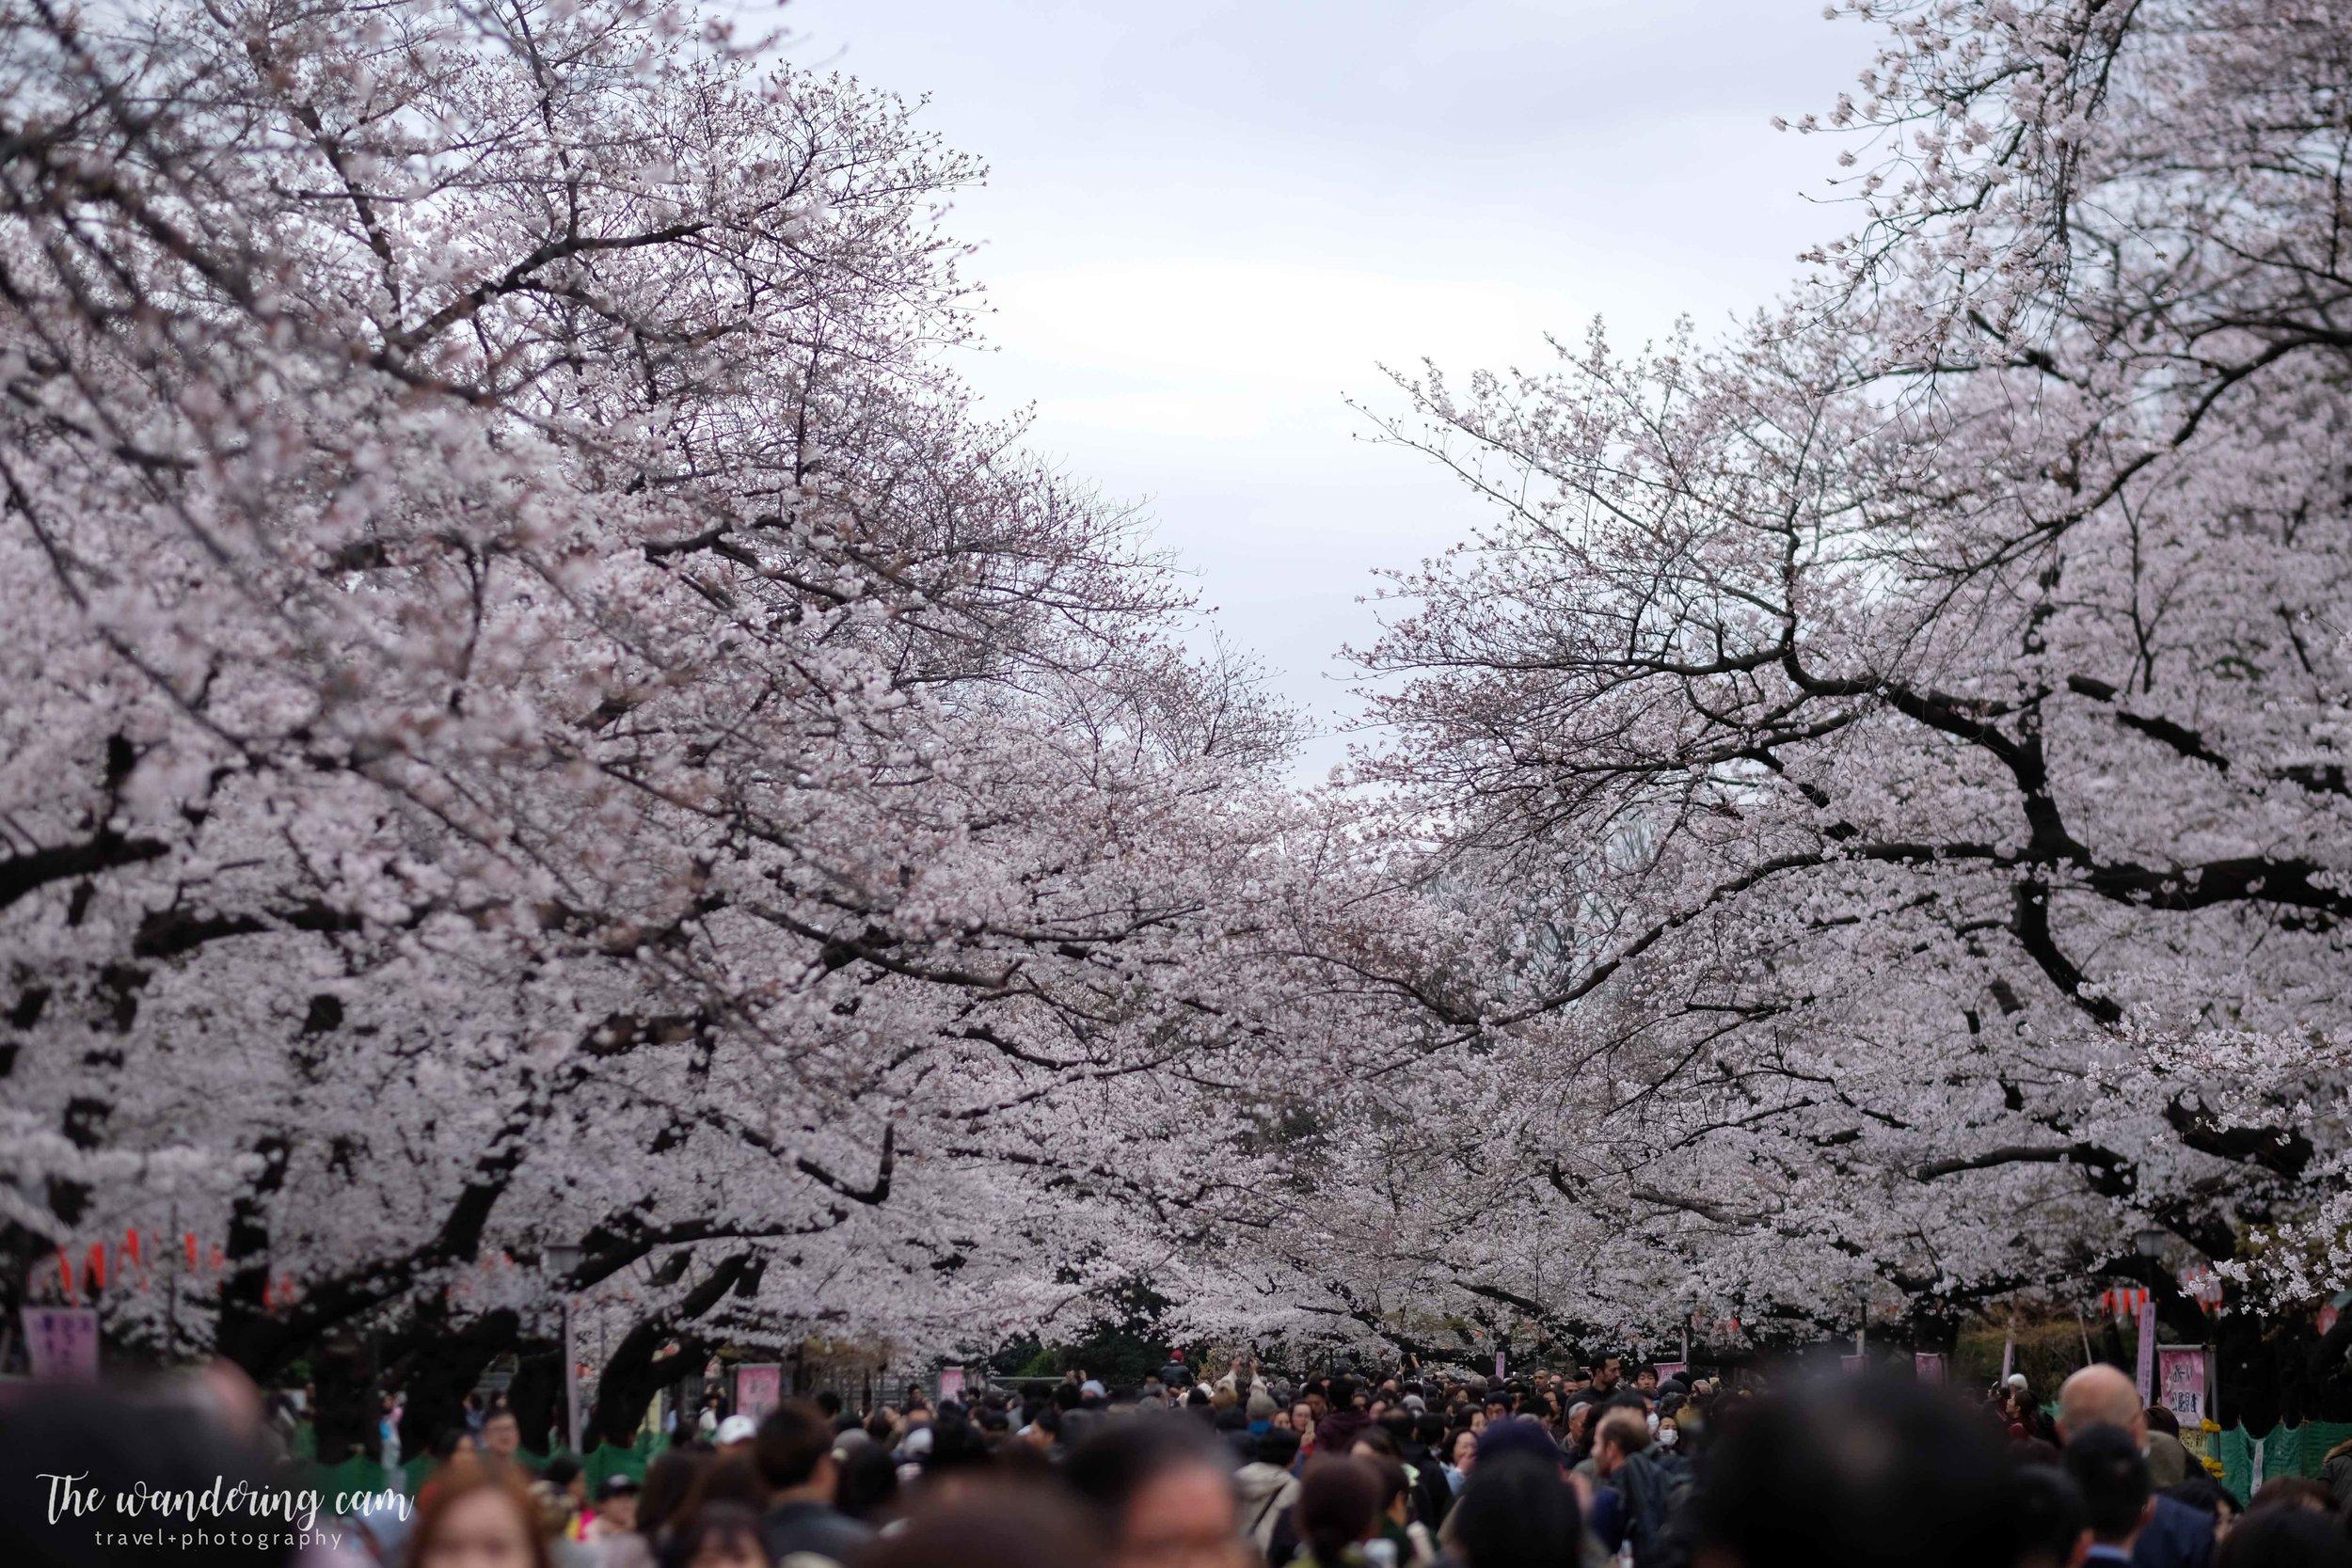 thewanderingcam_sakura_uenopark-4877.jpg